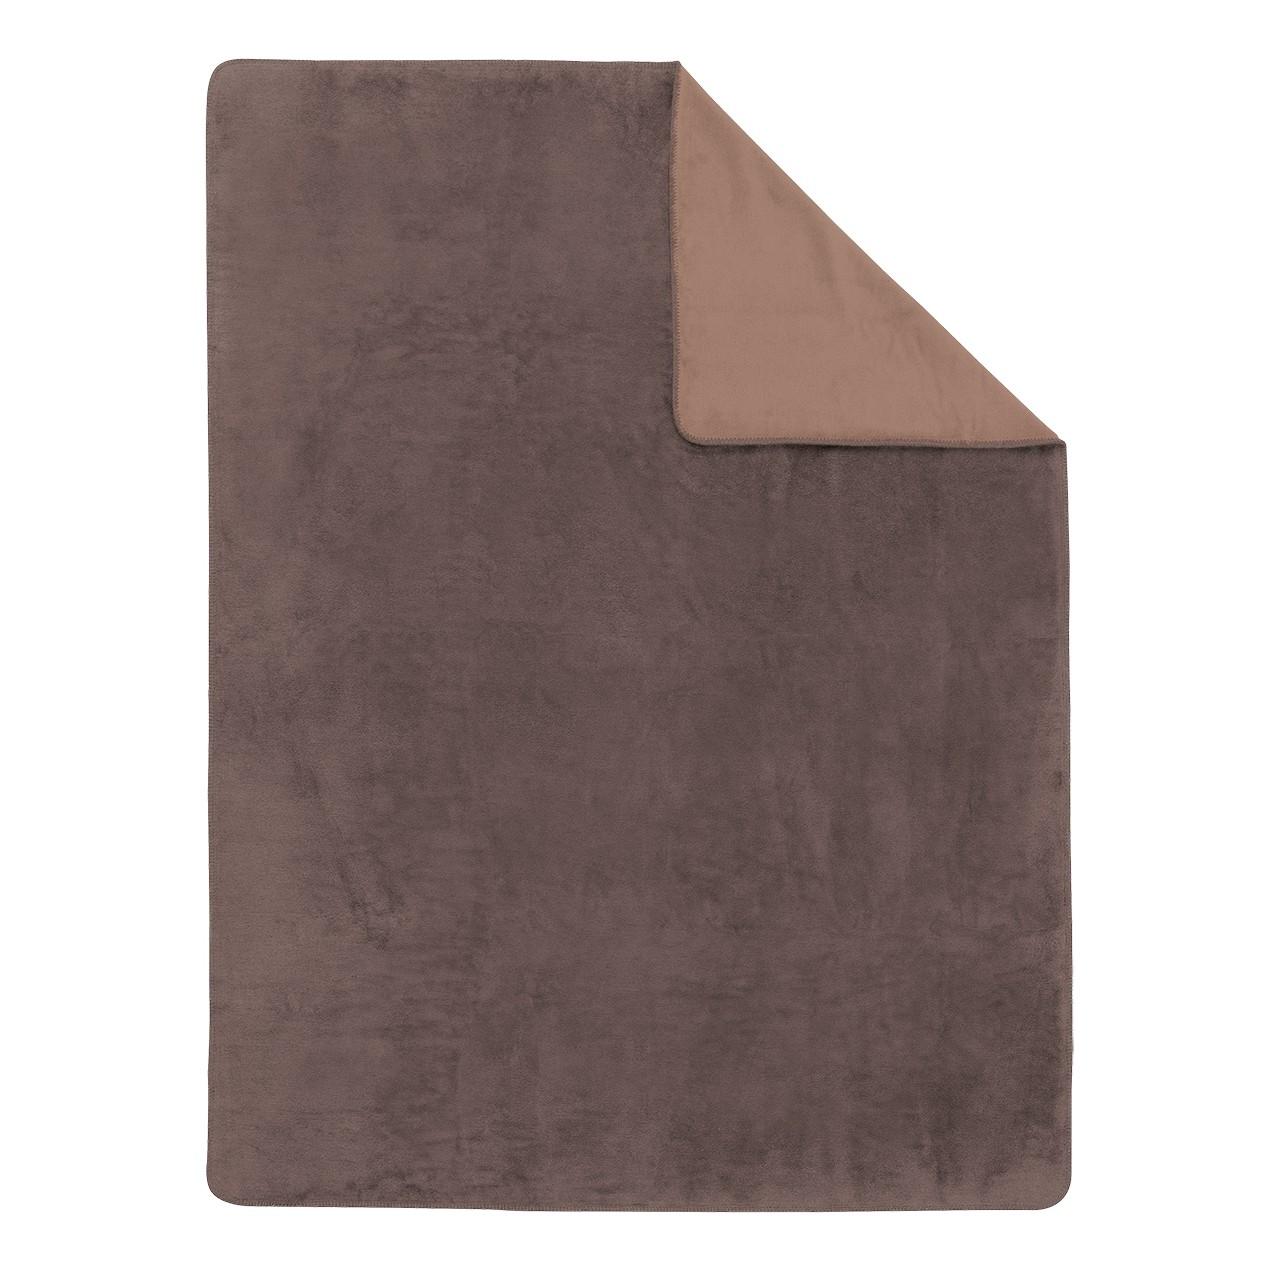 Home 24 - Couverture unie double-face sorrento - marron / marron café - 150 x 200 cm, ibena